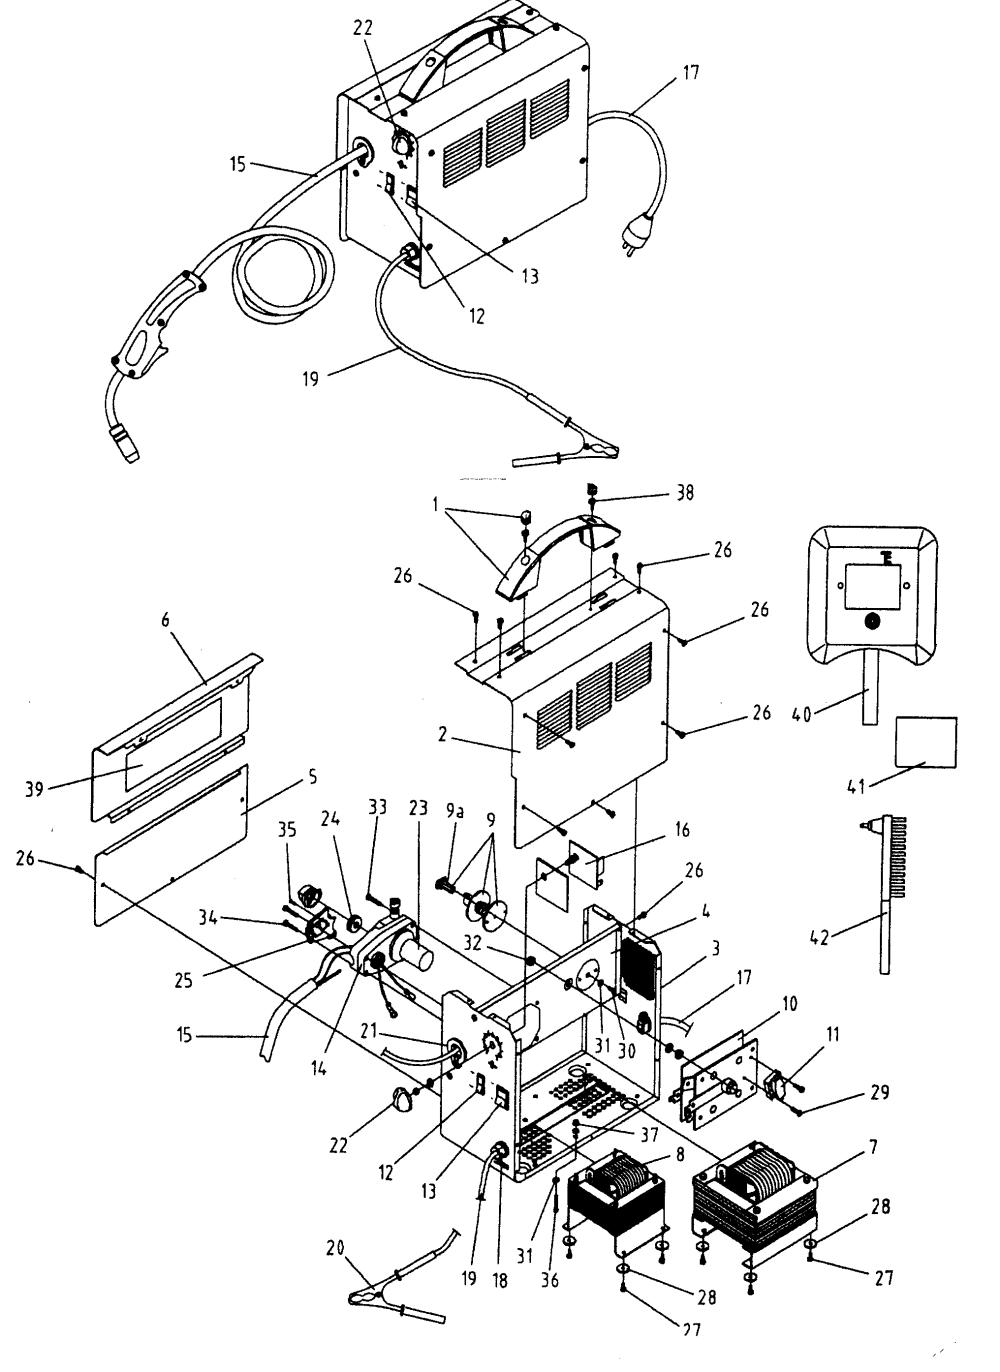 medium resolution of mig welder parts diagram craftsman mig welder parts model 196205680